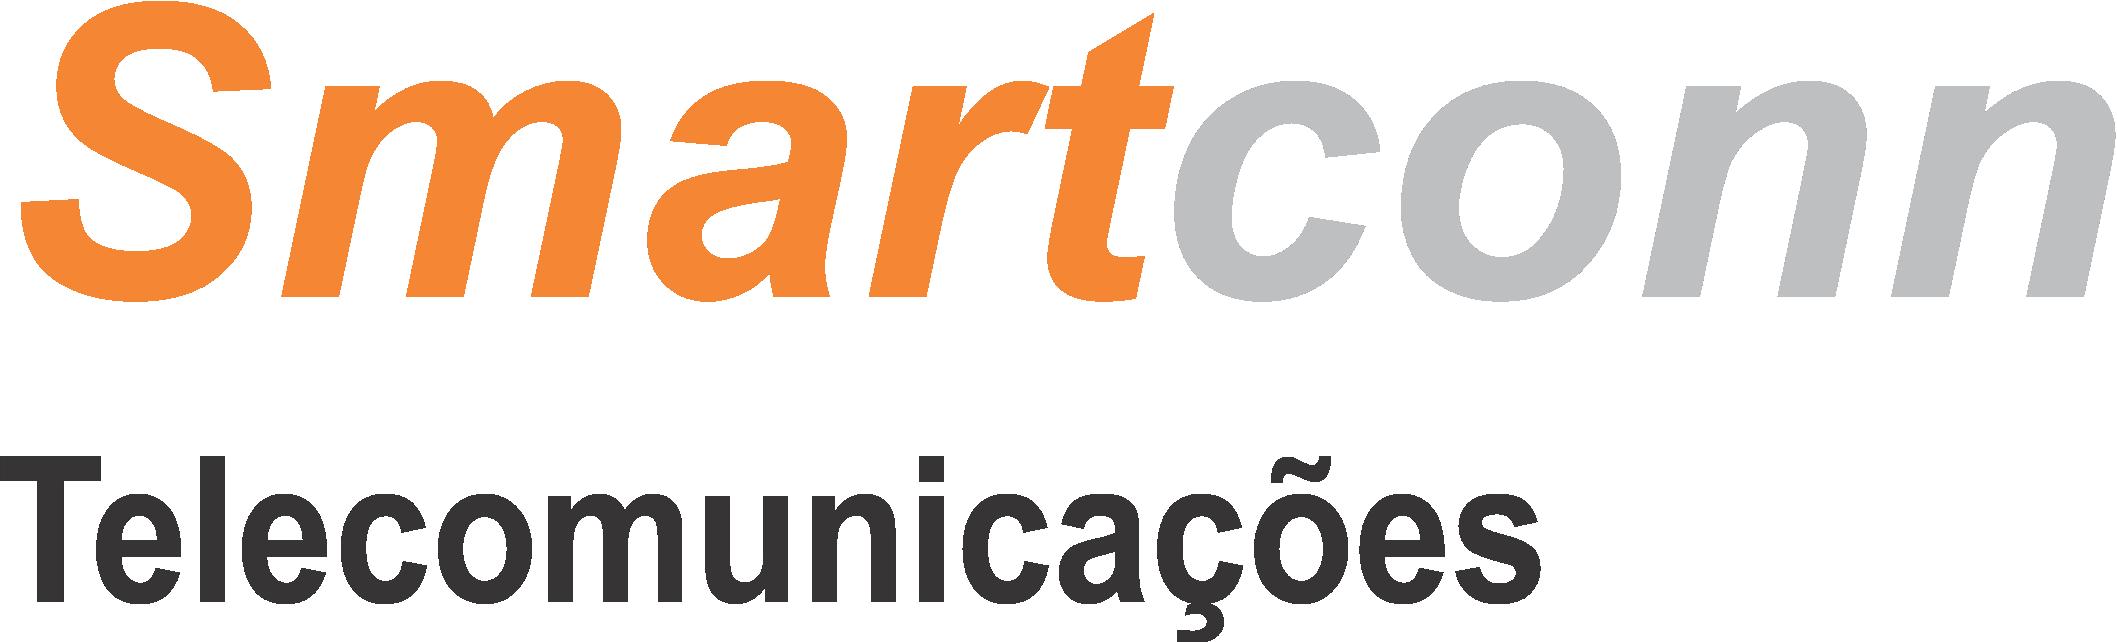 Smartconn Corporate Solution